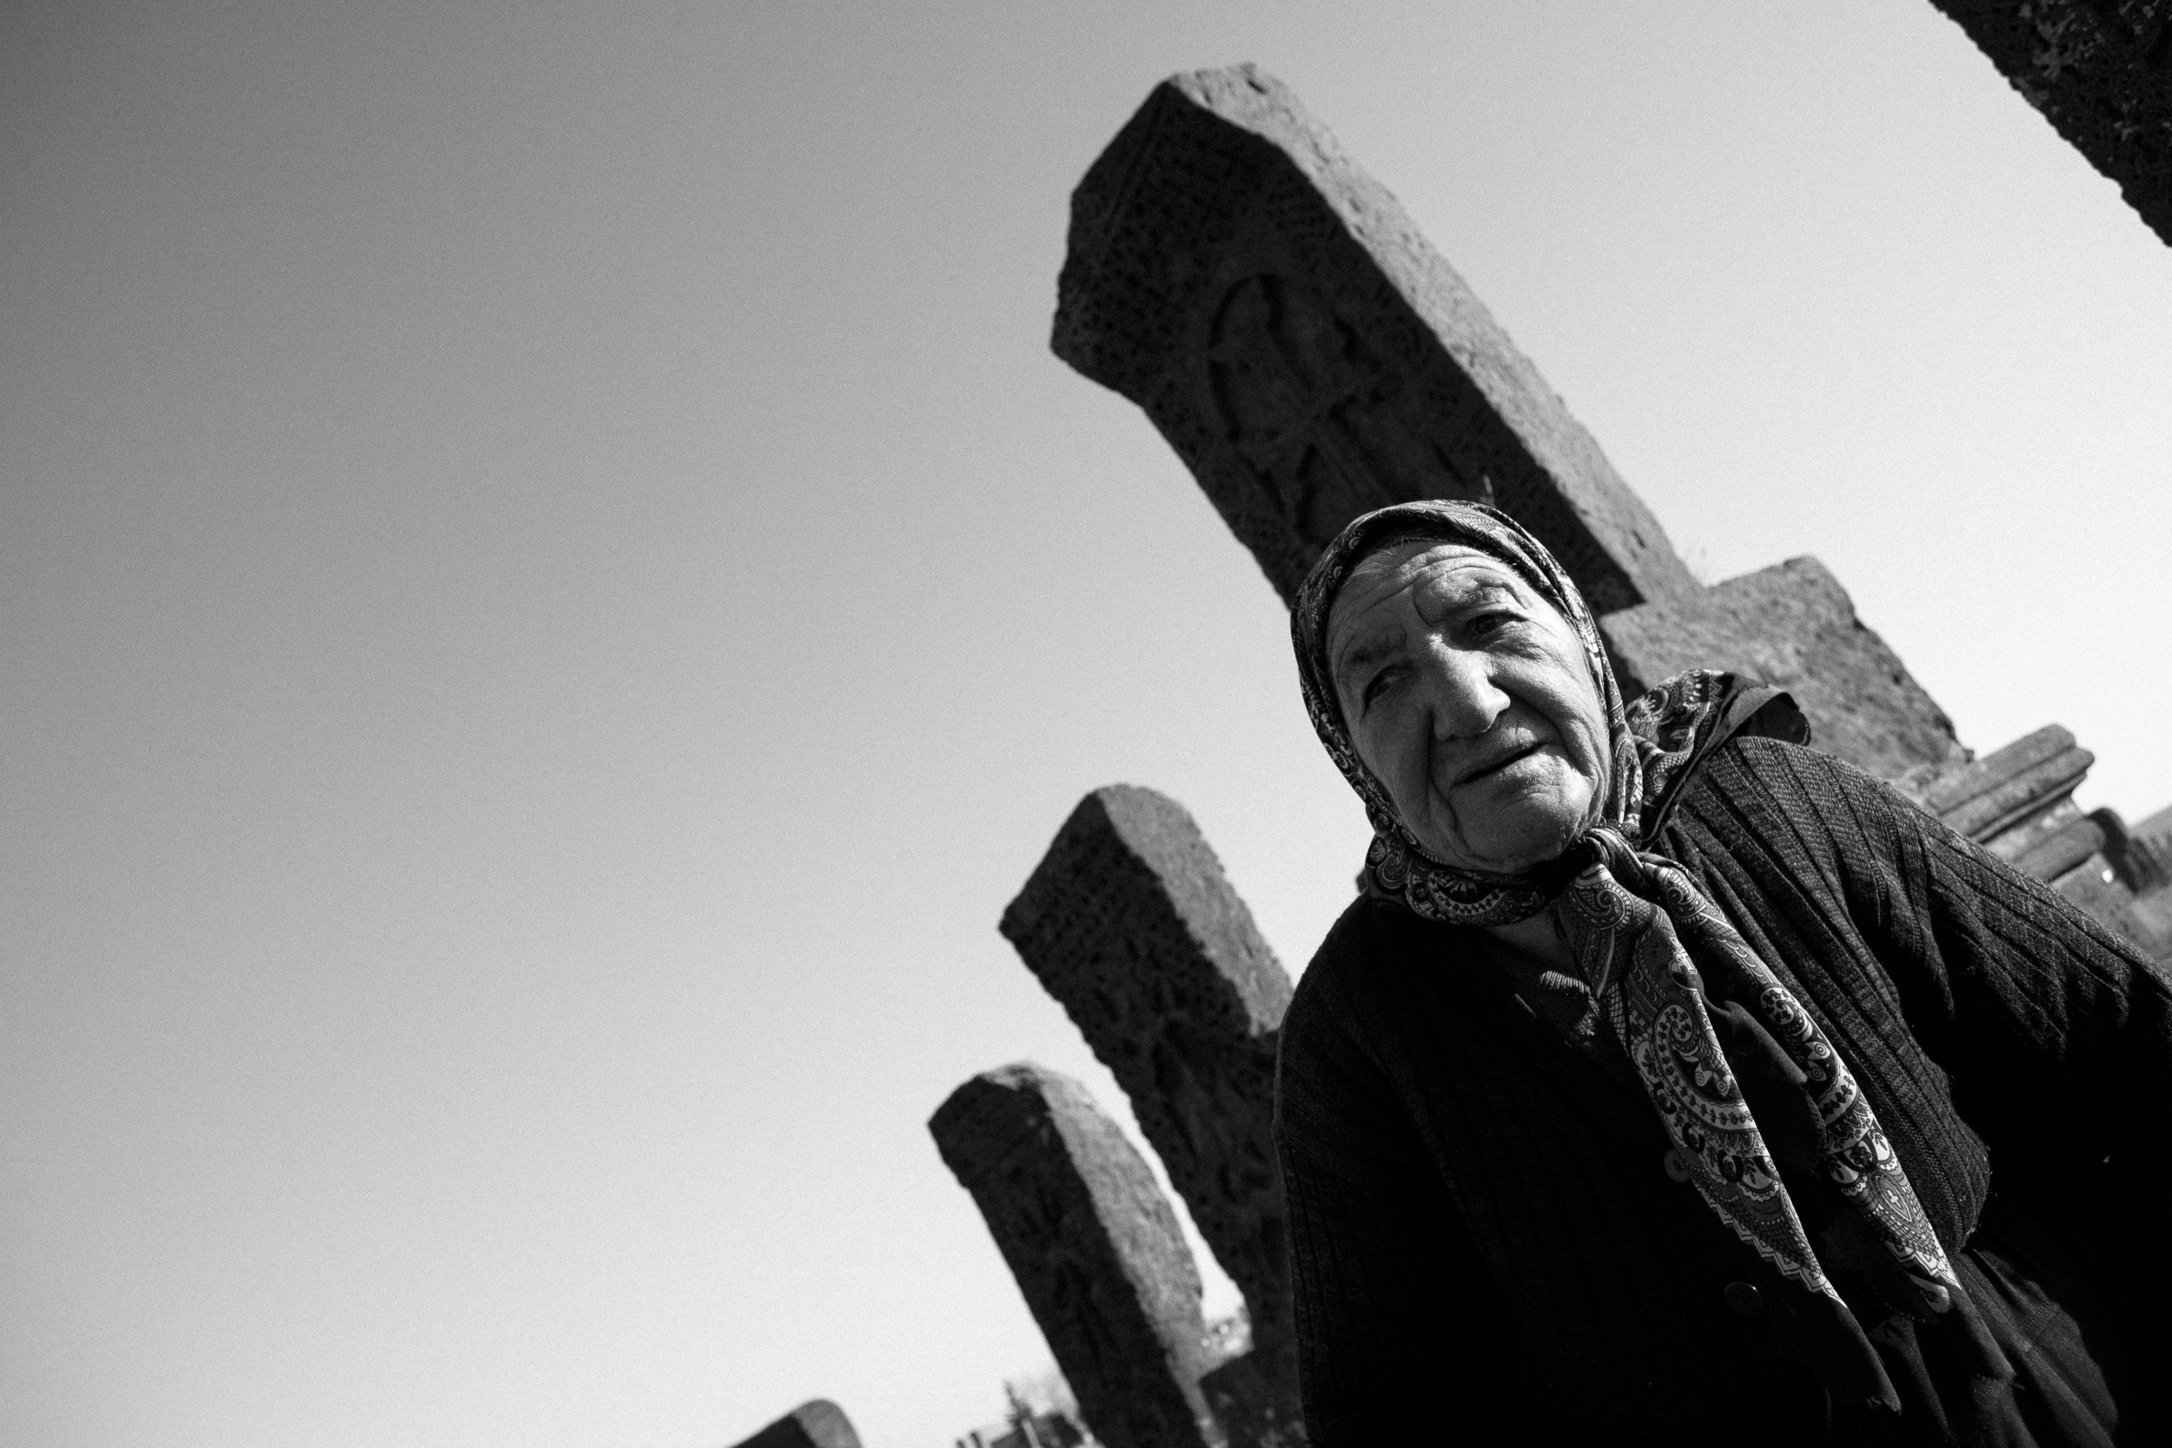 Noratus, Armenia, 2009